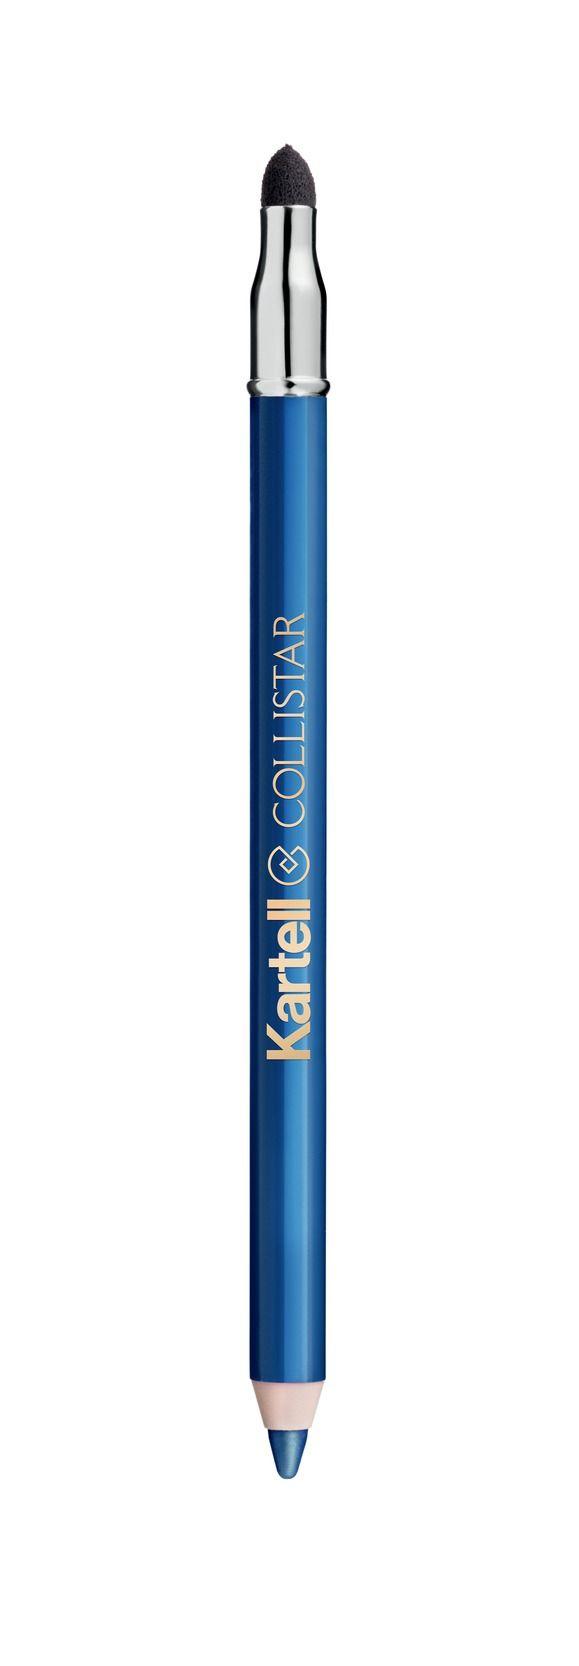 Matita Professionale Occhi N° 16 Blu Shanghai#Collistar #beauty #italy #Kartell #design #Trasparenze #Transparency #2015 #makeup #matita #pencil #occhi #eyes #blu #blue